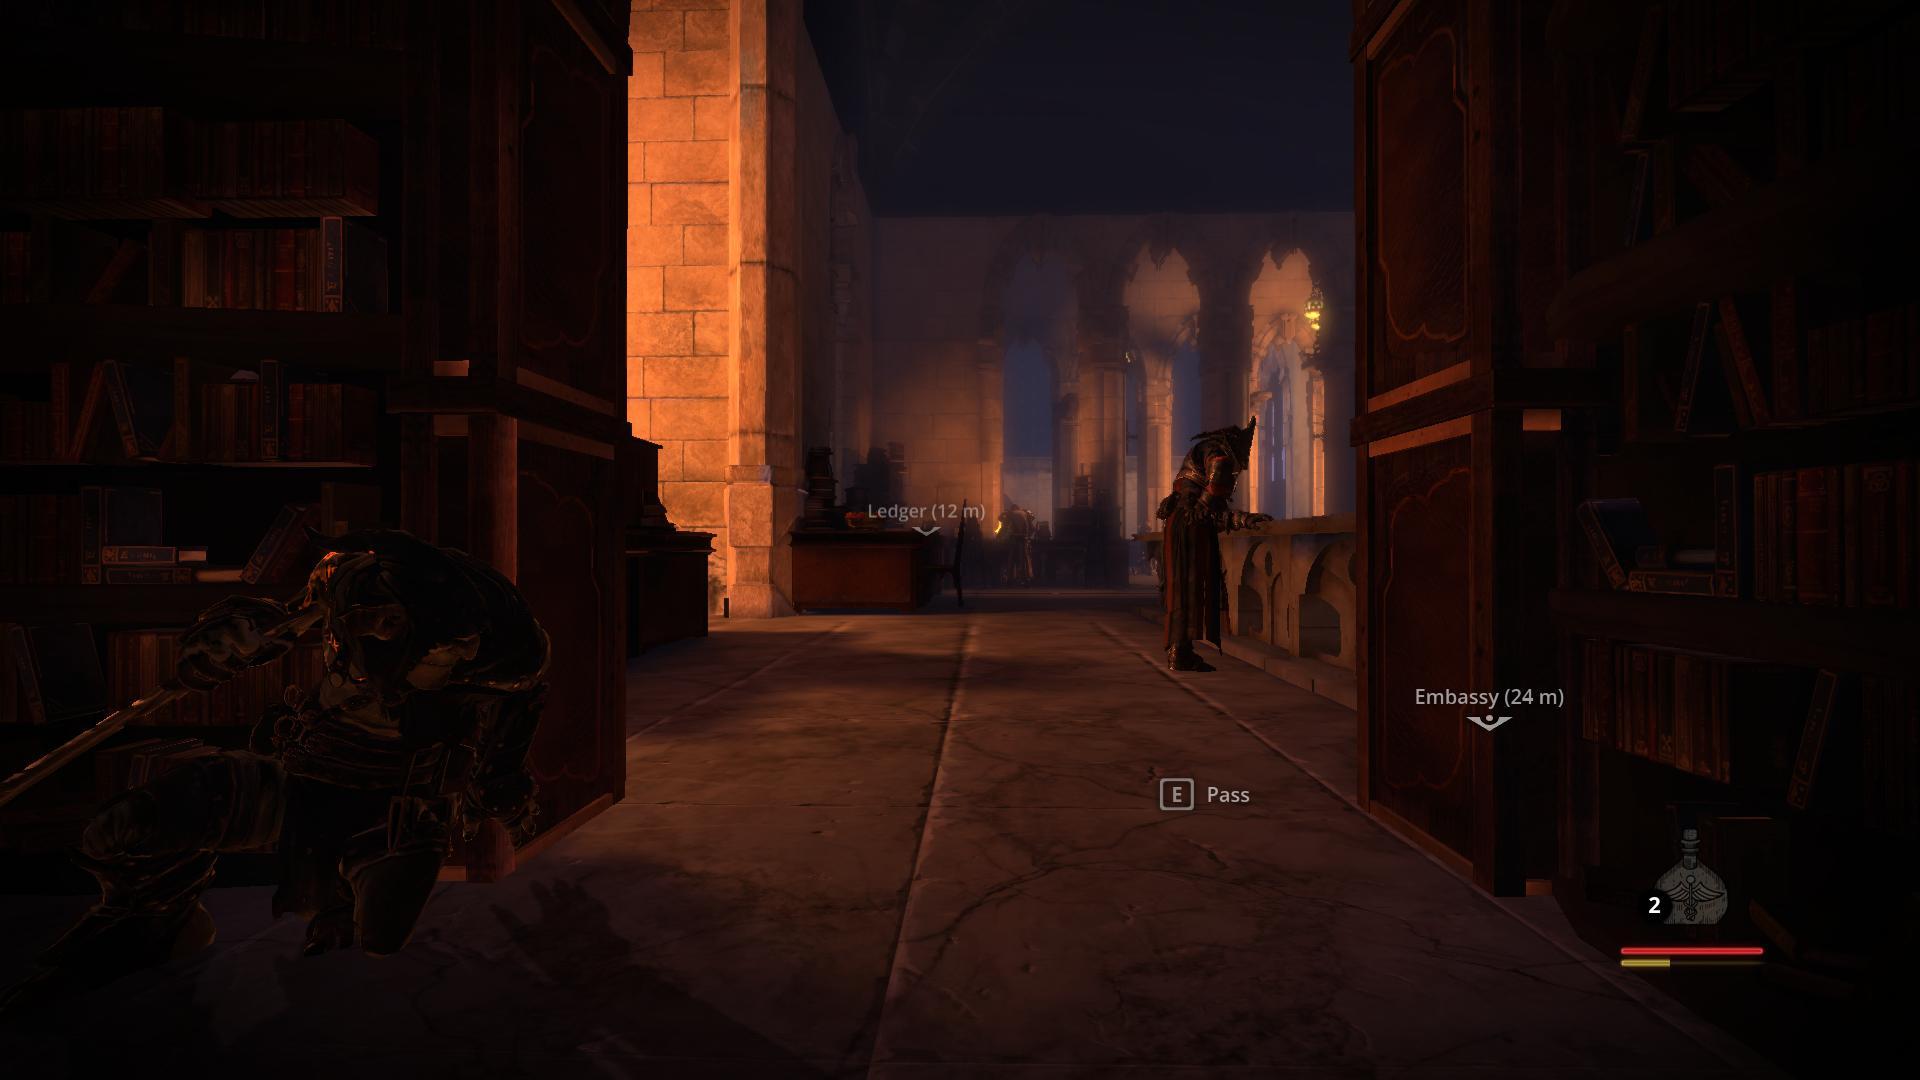 Recenze Styx: Master of Shadows - Goblin na lovu 9630